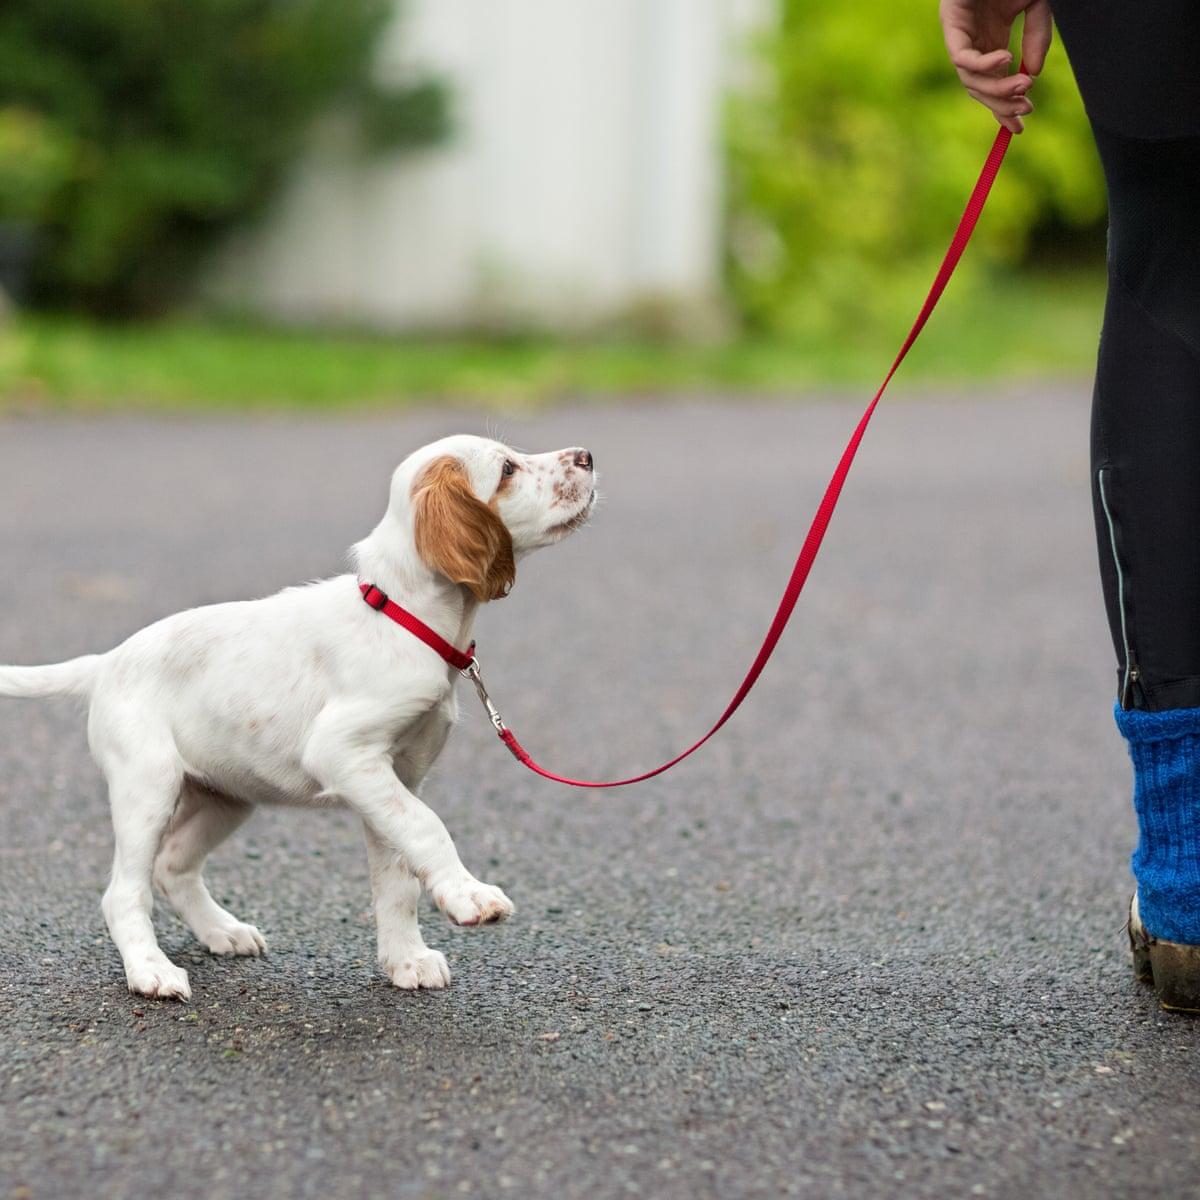 Dog walkers at Howard University infringe on 'black Mecca', students say |  Washington DC | The Guardian